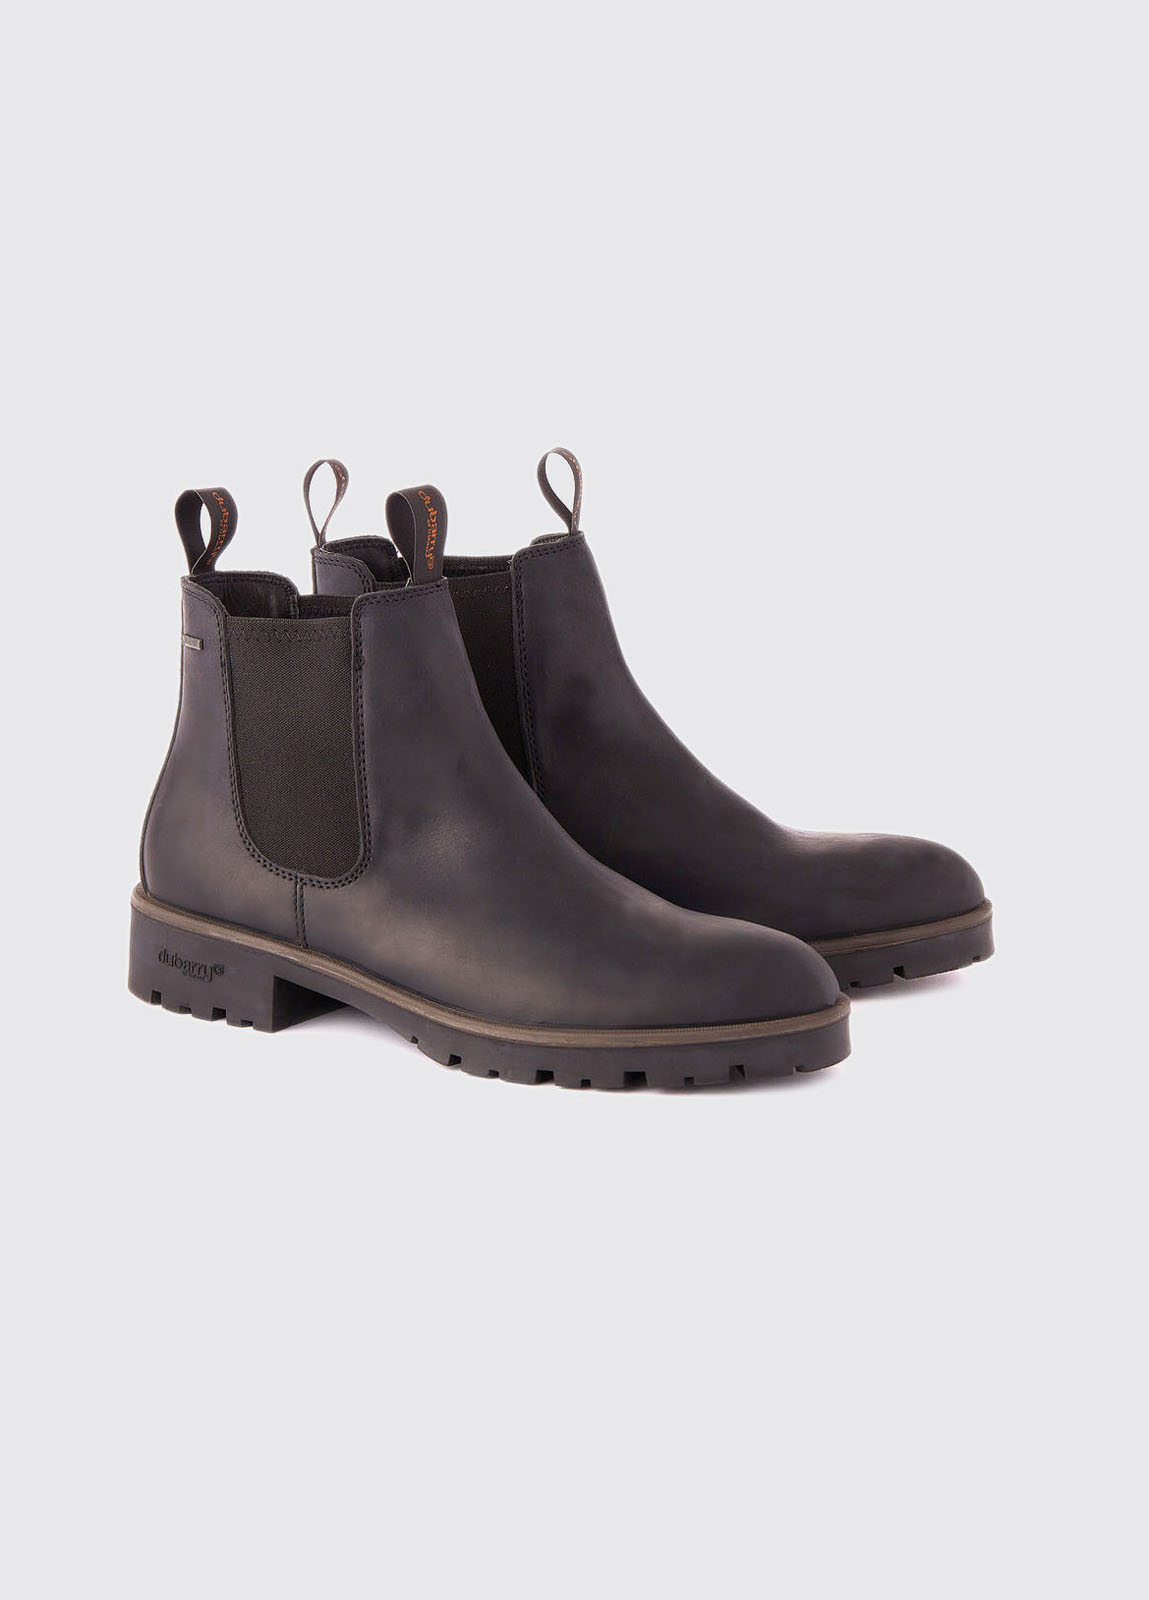 Antrim Country Boot - Black